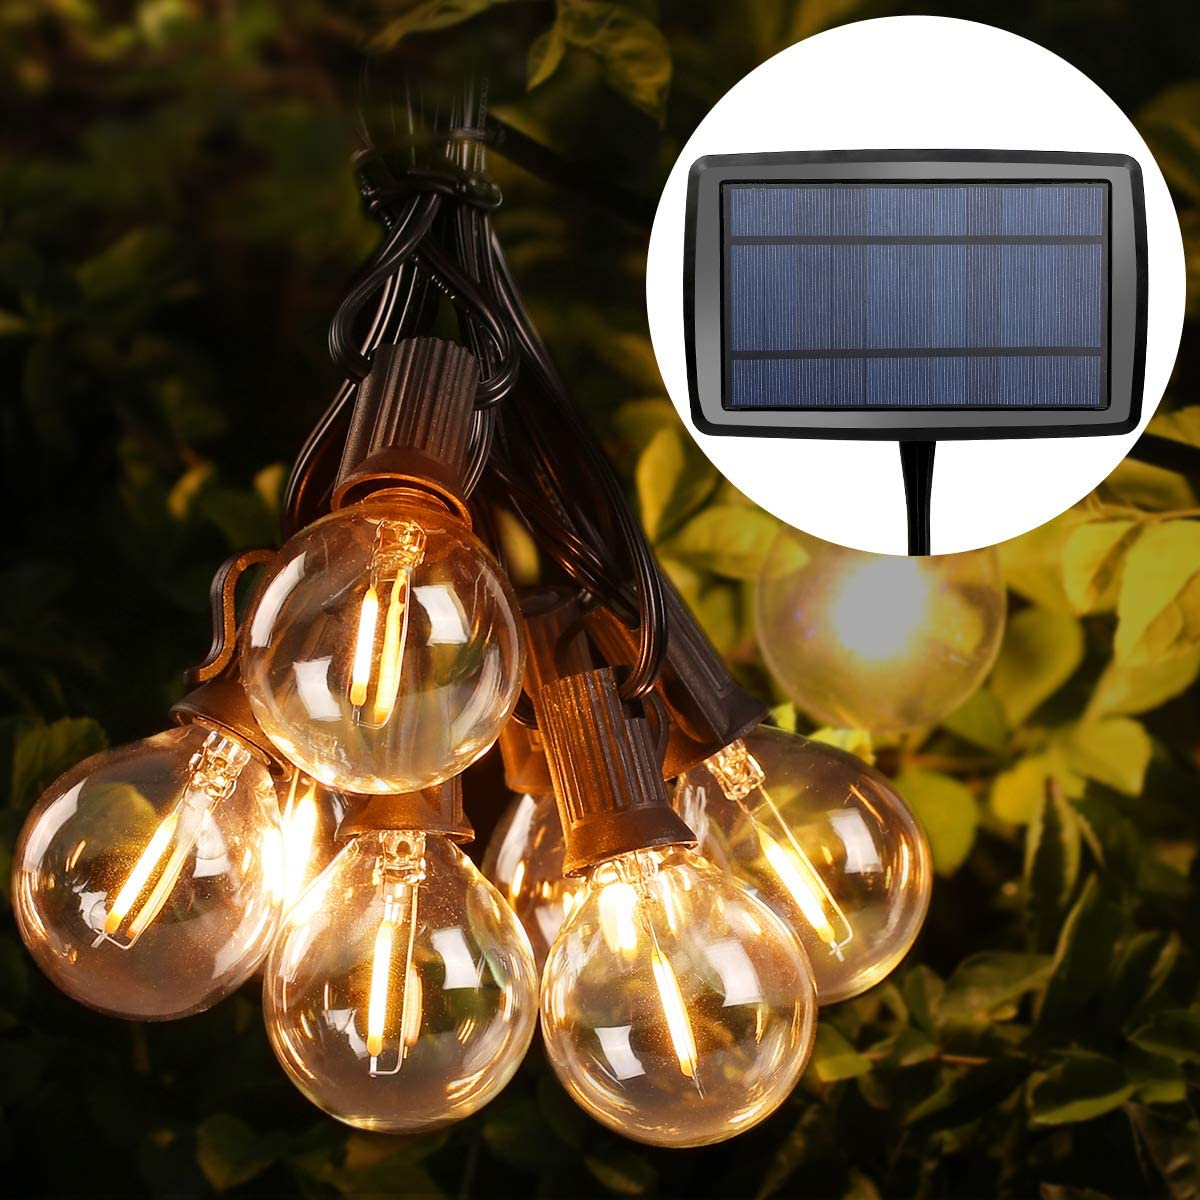 le solar outdoor string lights 25ft 26 units g40 patio lights waterproof solar edison bulb string lights for indoor outdoor garden patio bistro